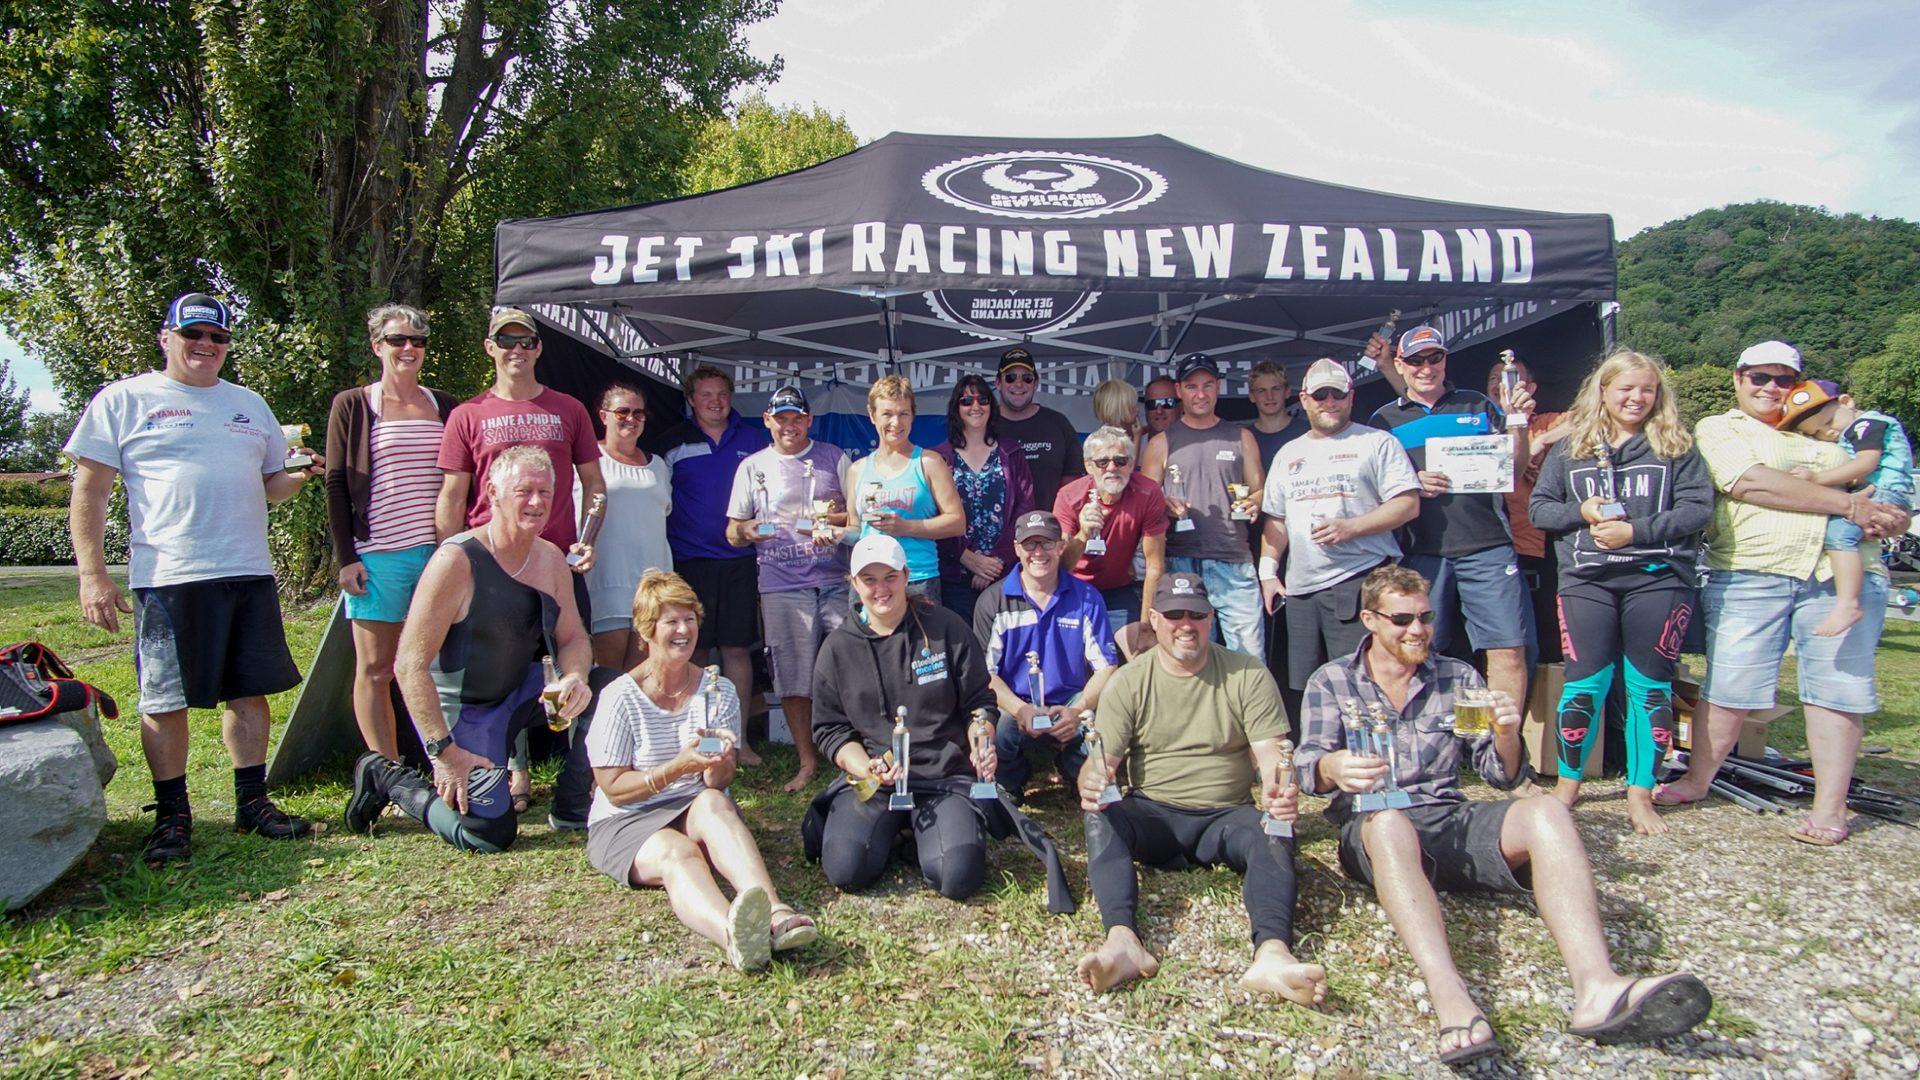 Jet Ski Racing NZ - The Official Site of NZ Aquabike Racing